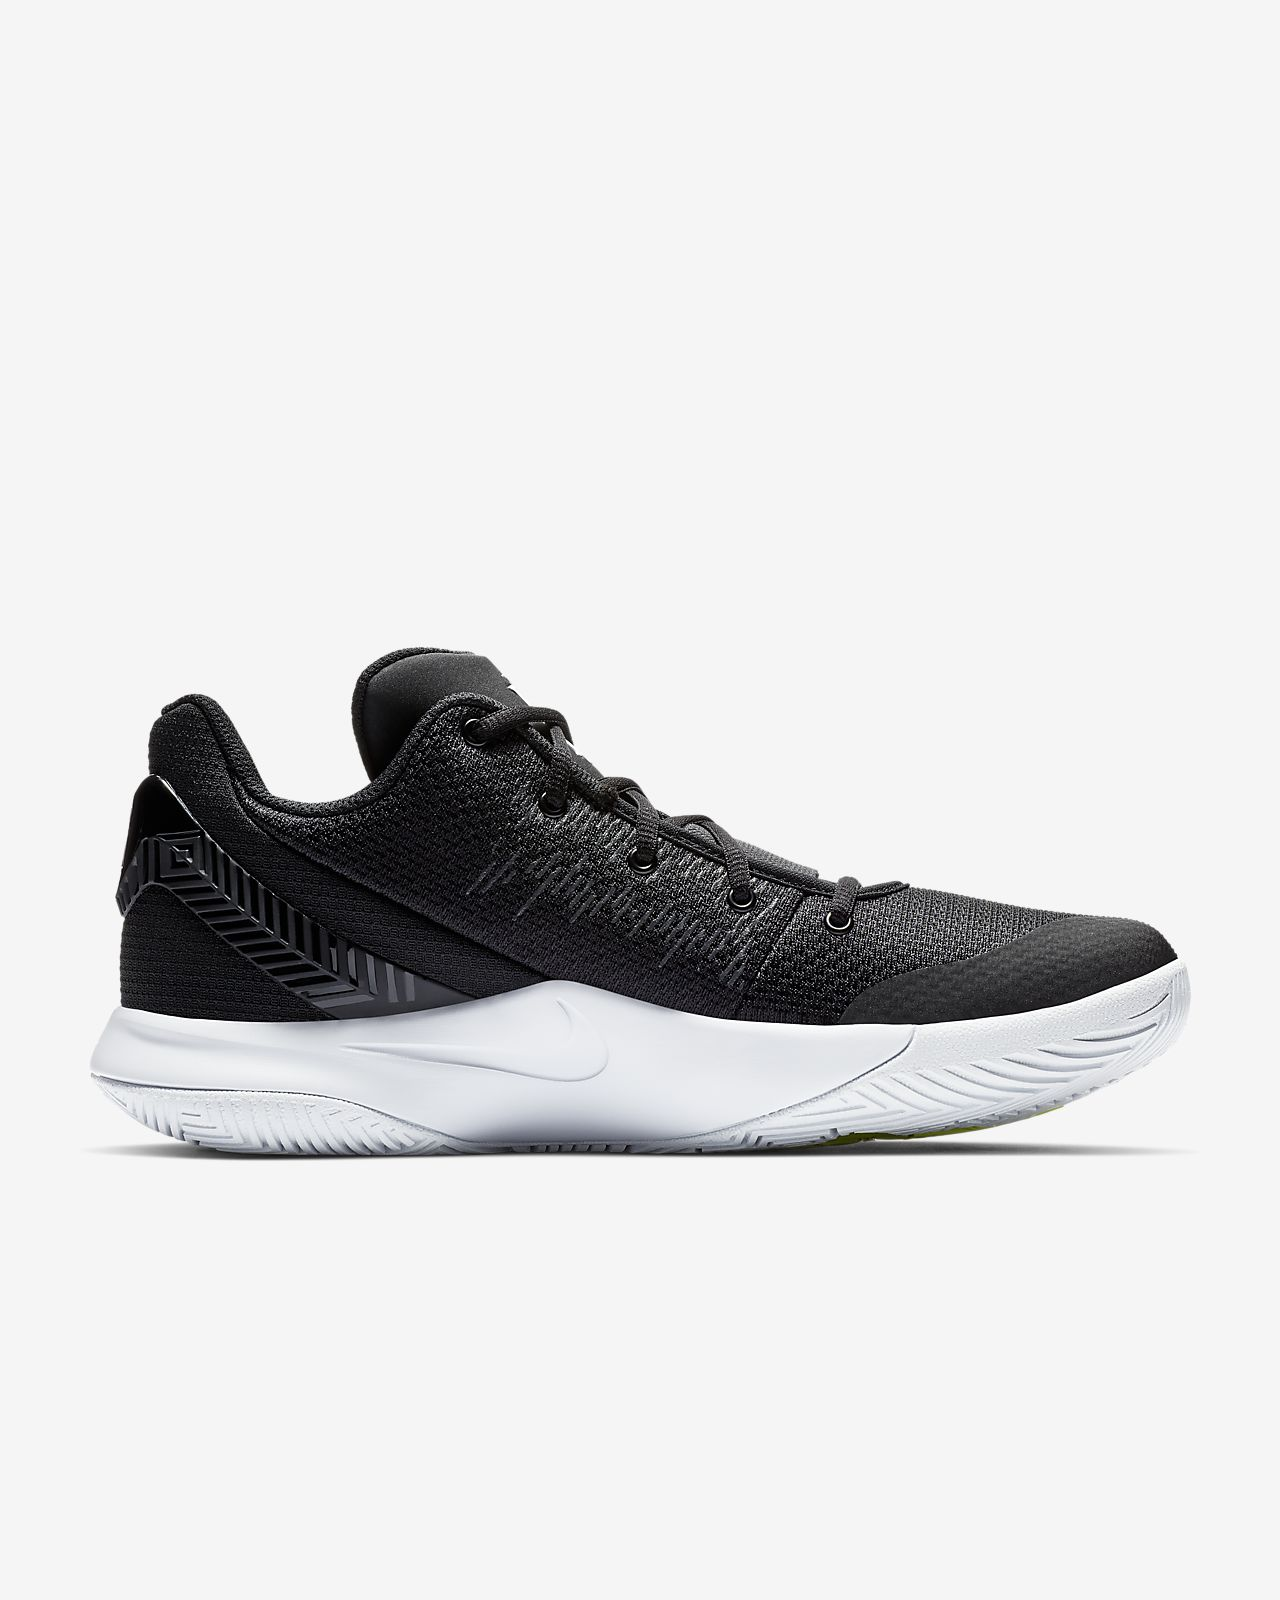 95cd2ad7544 Kyrie Flytrap II Basketball Shoe. Nike.com SA